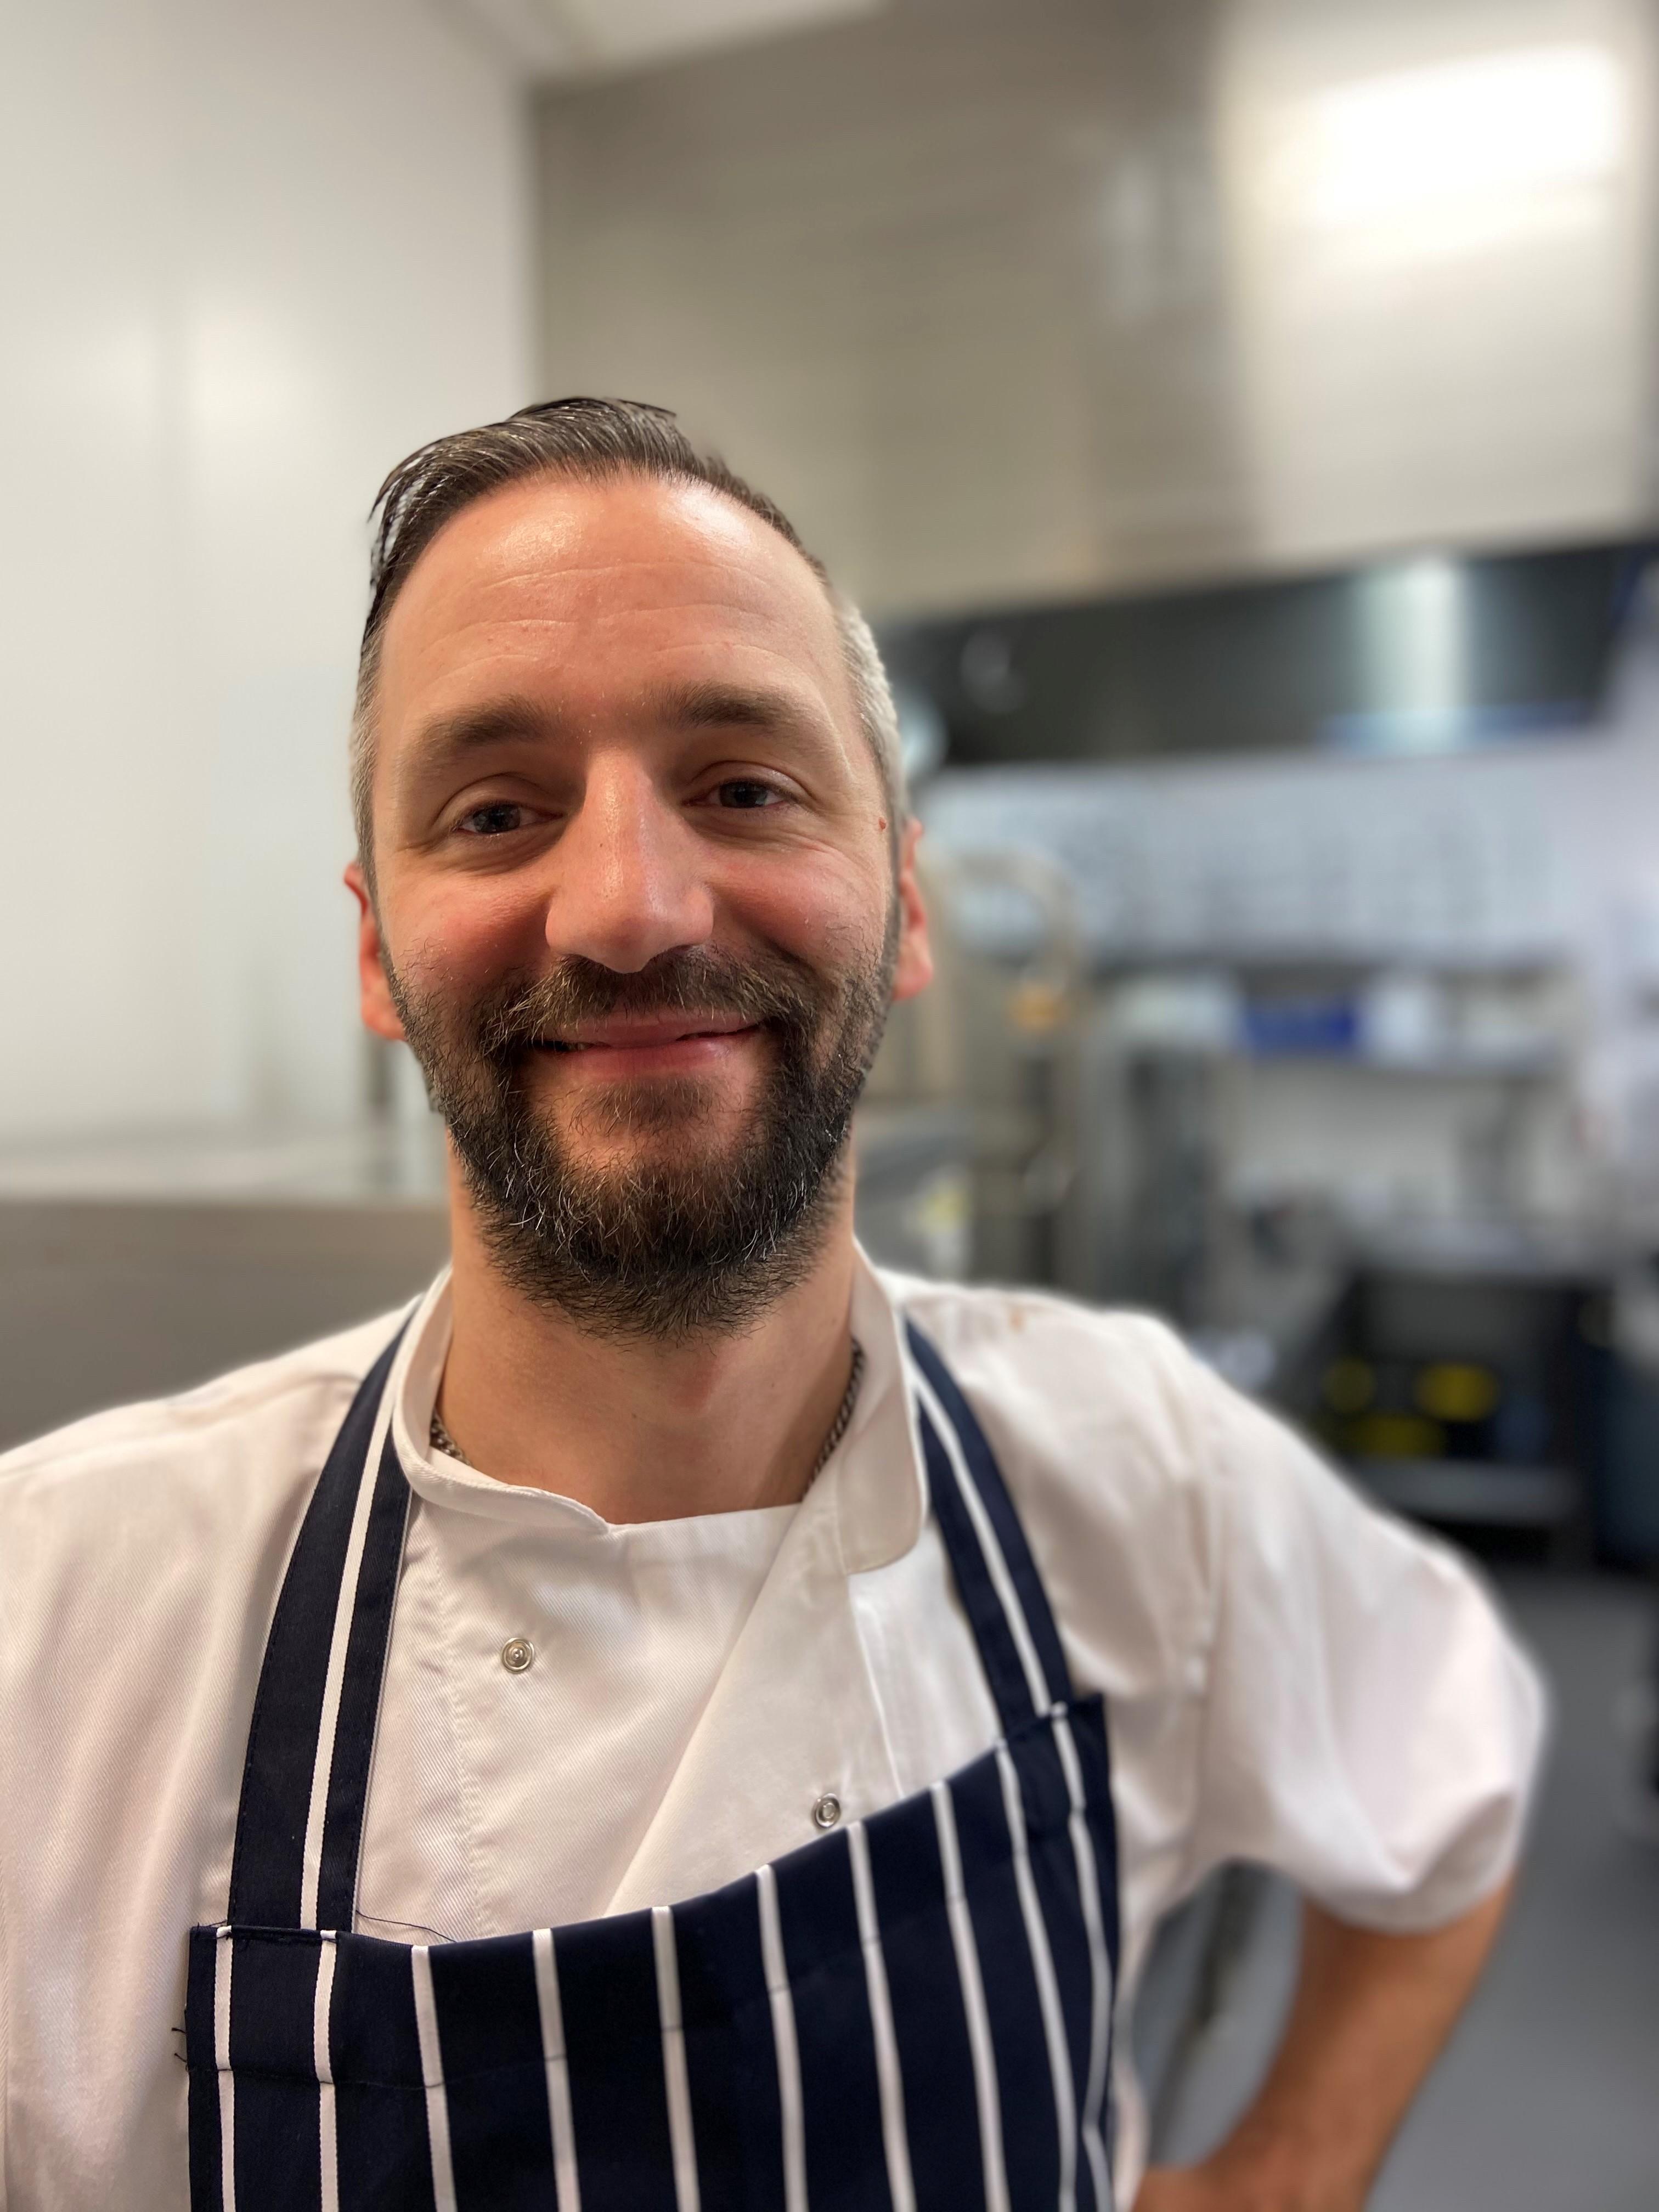 Ian Elson head chef at The Cornwall 2021